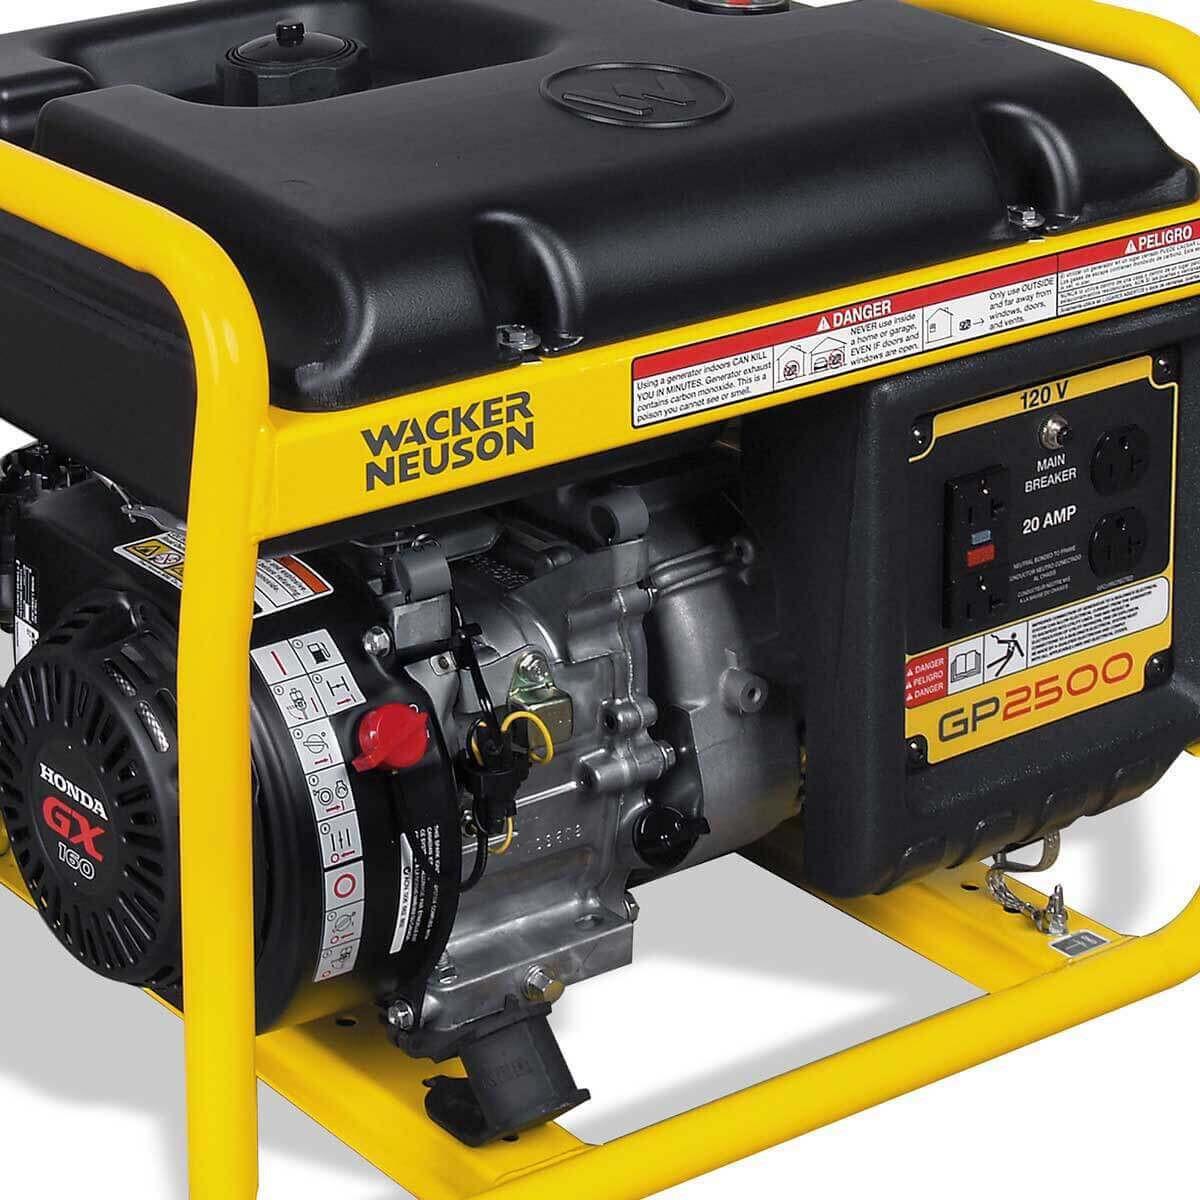 Wacker Neuson GP 2500A portable generator